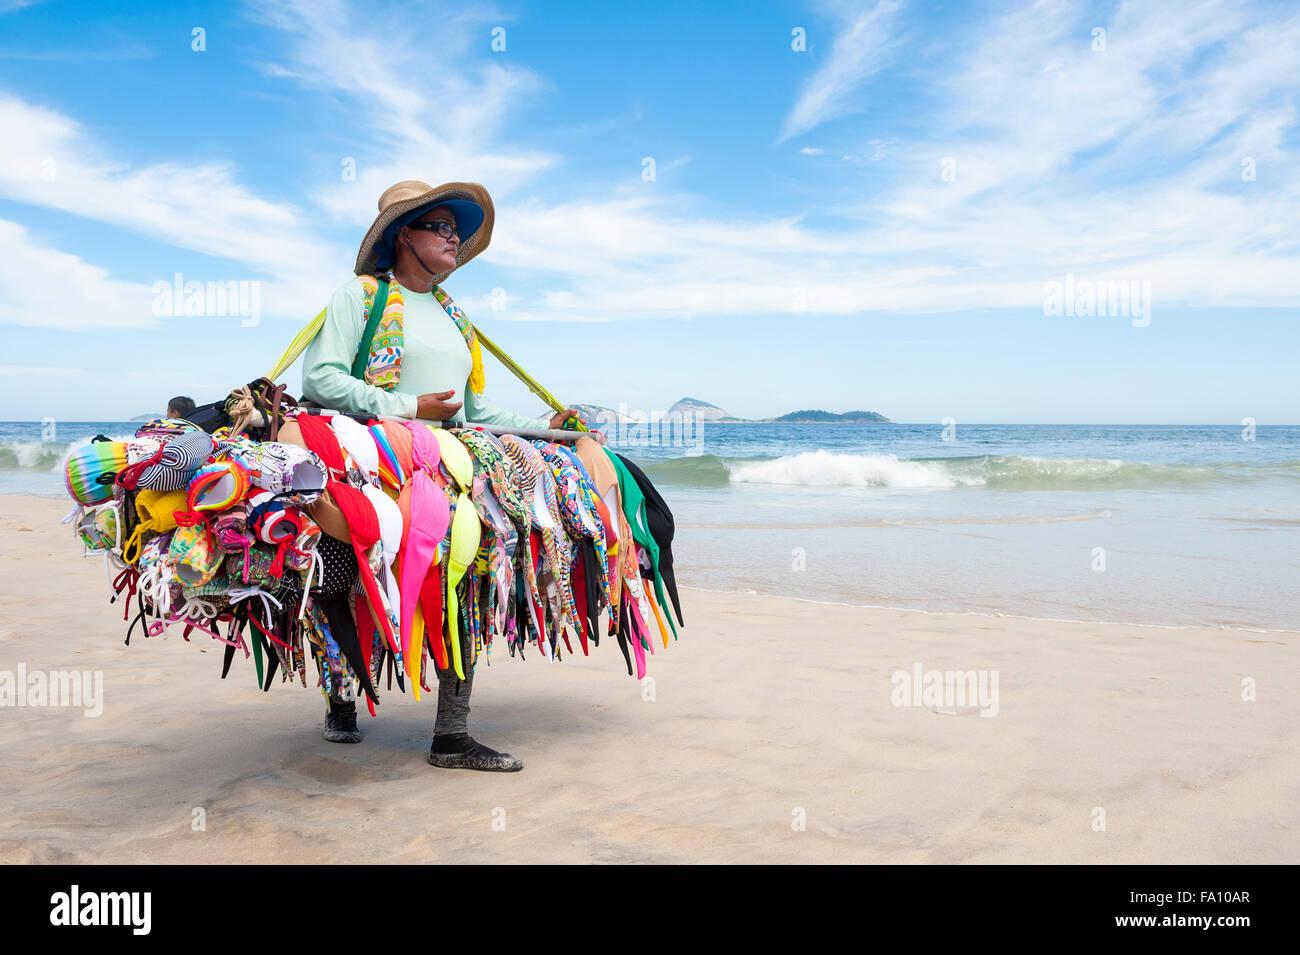 Río de Janeiro, Brasil - 15 de marzo de 2015: un proveedor de Playa Venta de bikinis lleva su mercancía Imagen De Stock